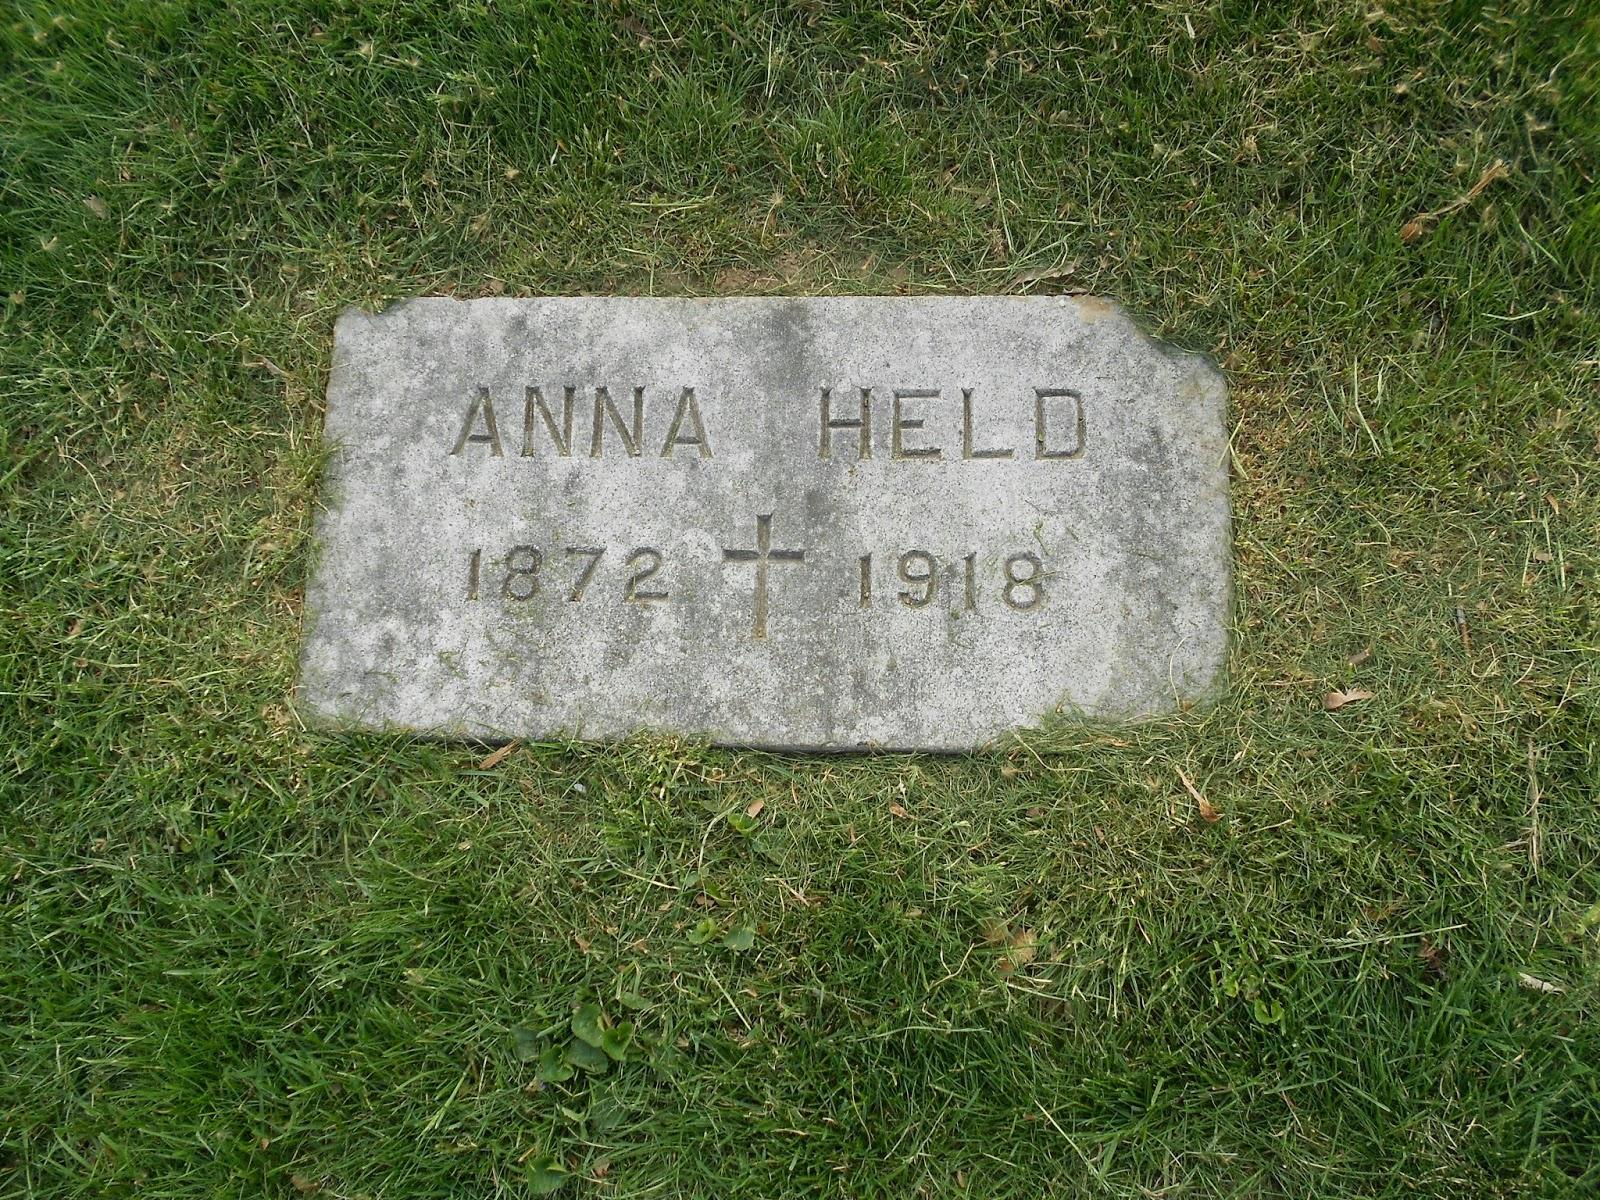 Gardens of Stone: Flo Ziegfeld's Girl: Anna Held